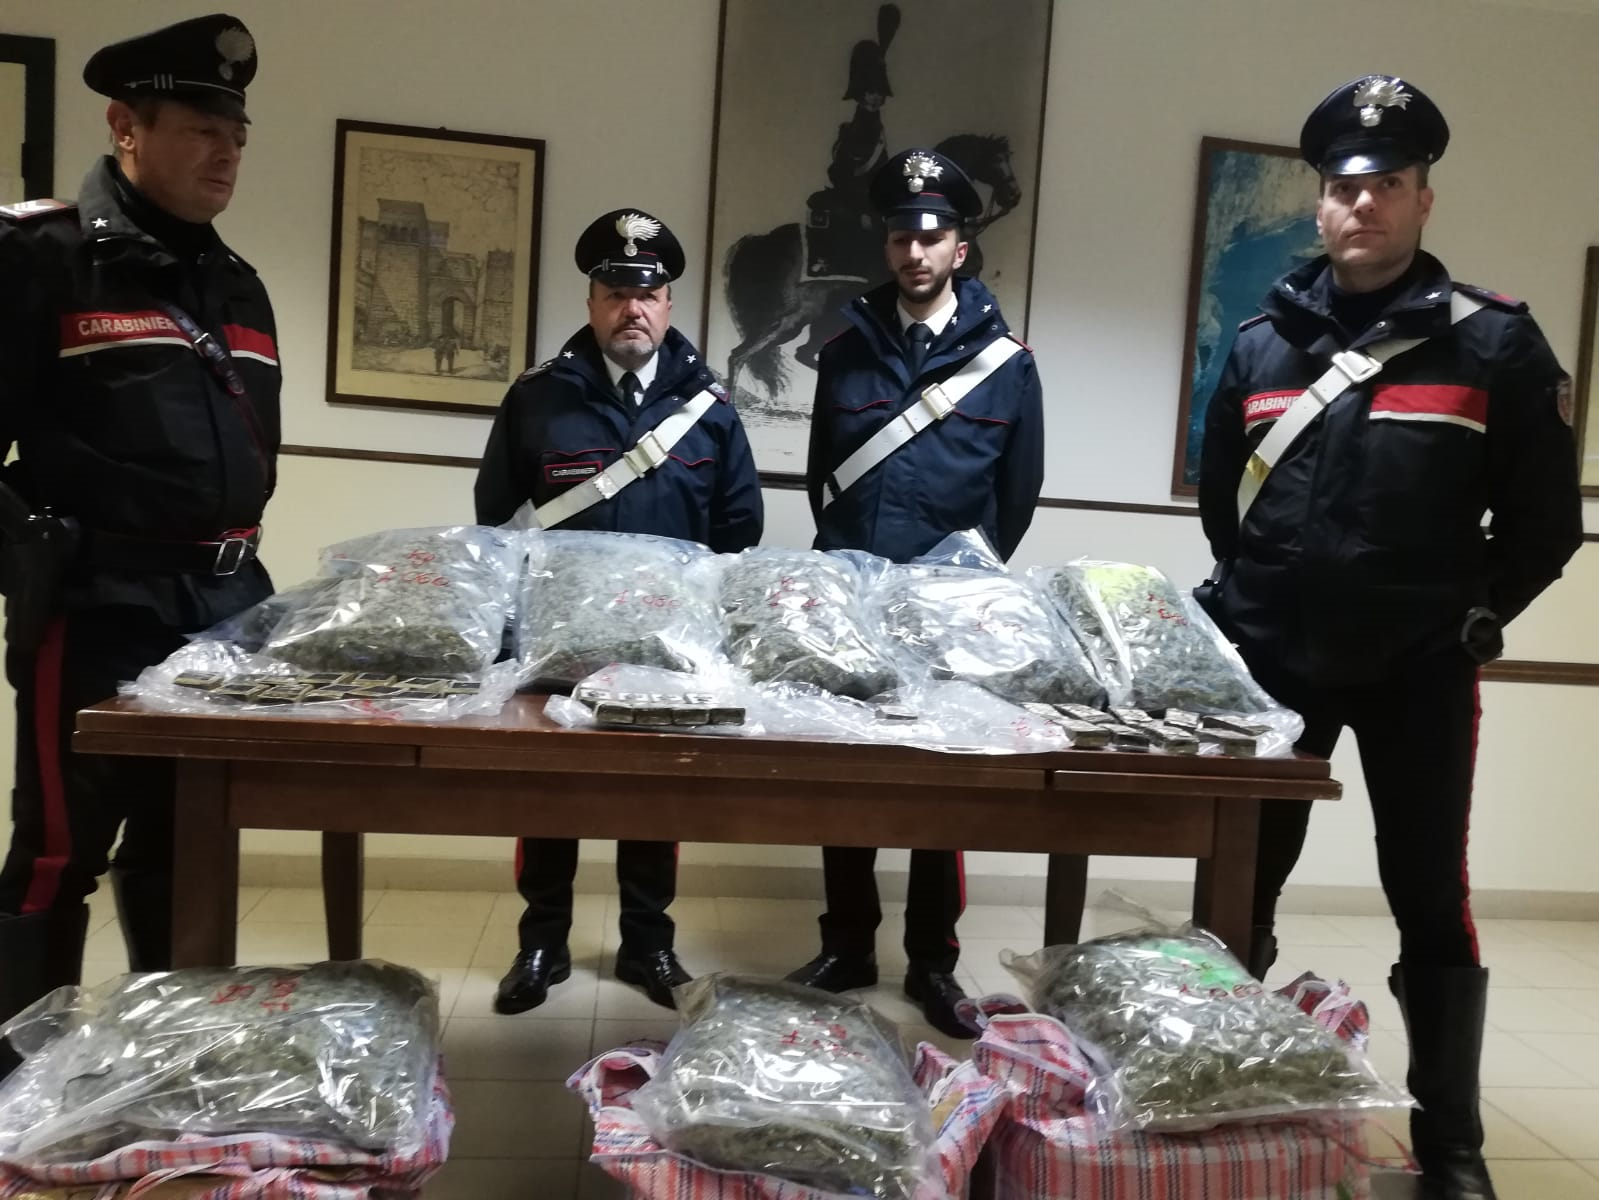 Gli stupefacenti sequestrati al 36enne: 27 kg di marijuana e circa 3 kg di hashish